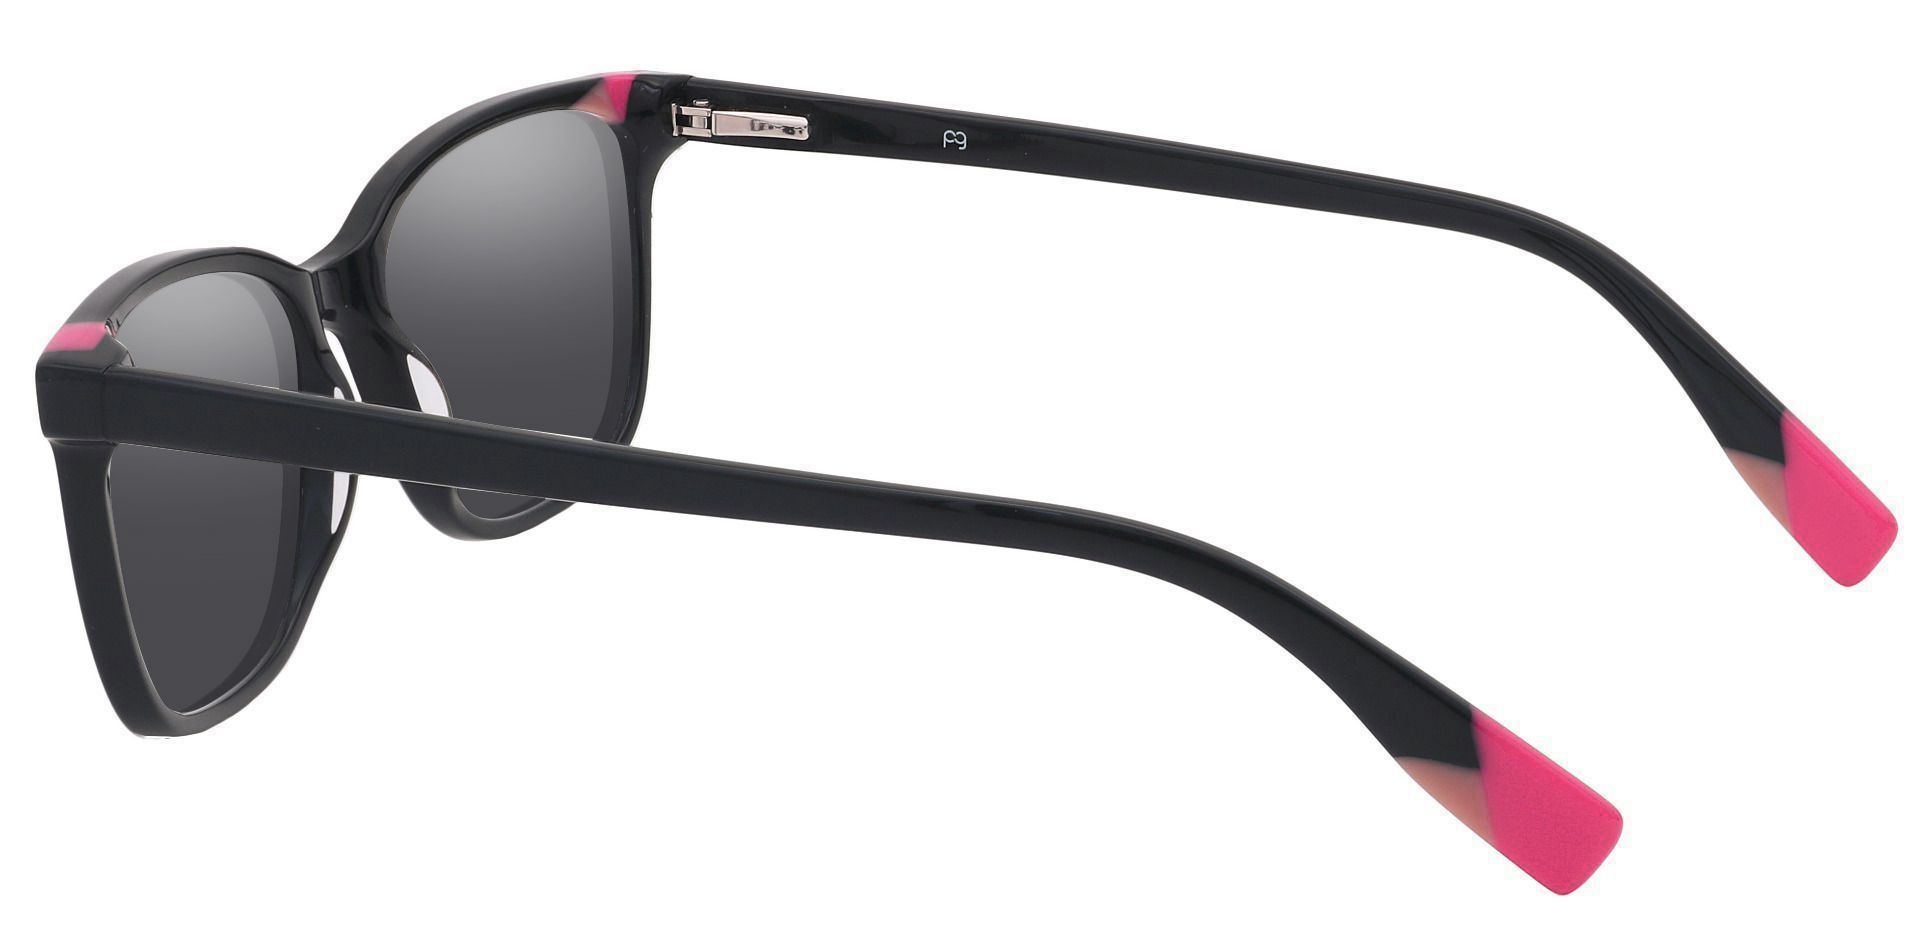 Odessa Square Prescription Sunglasses - Red Frame With Gray Lenses